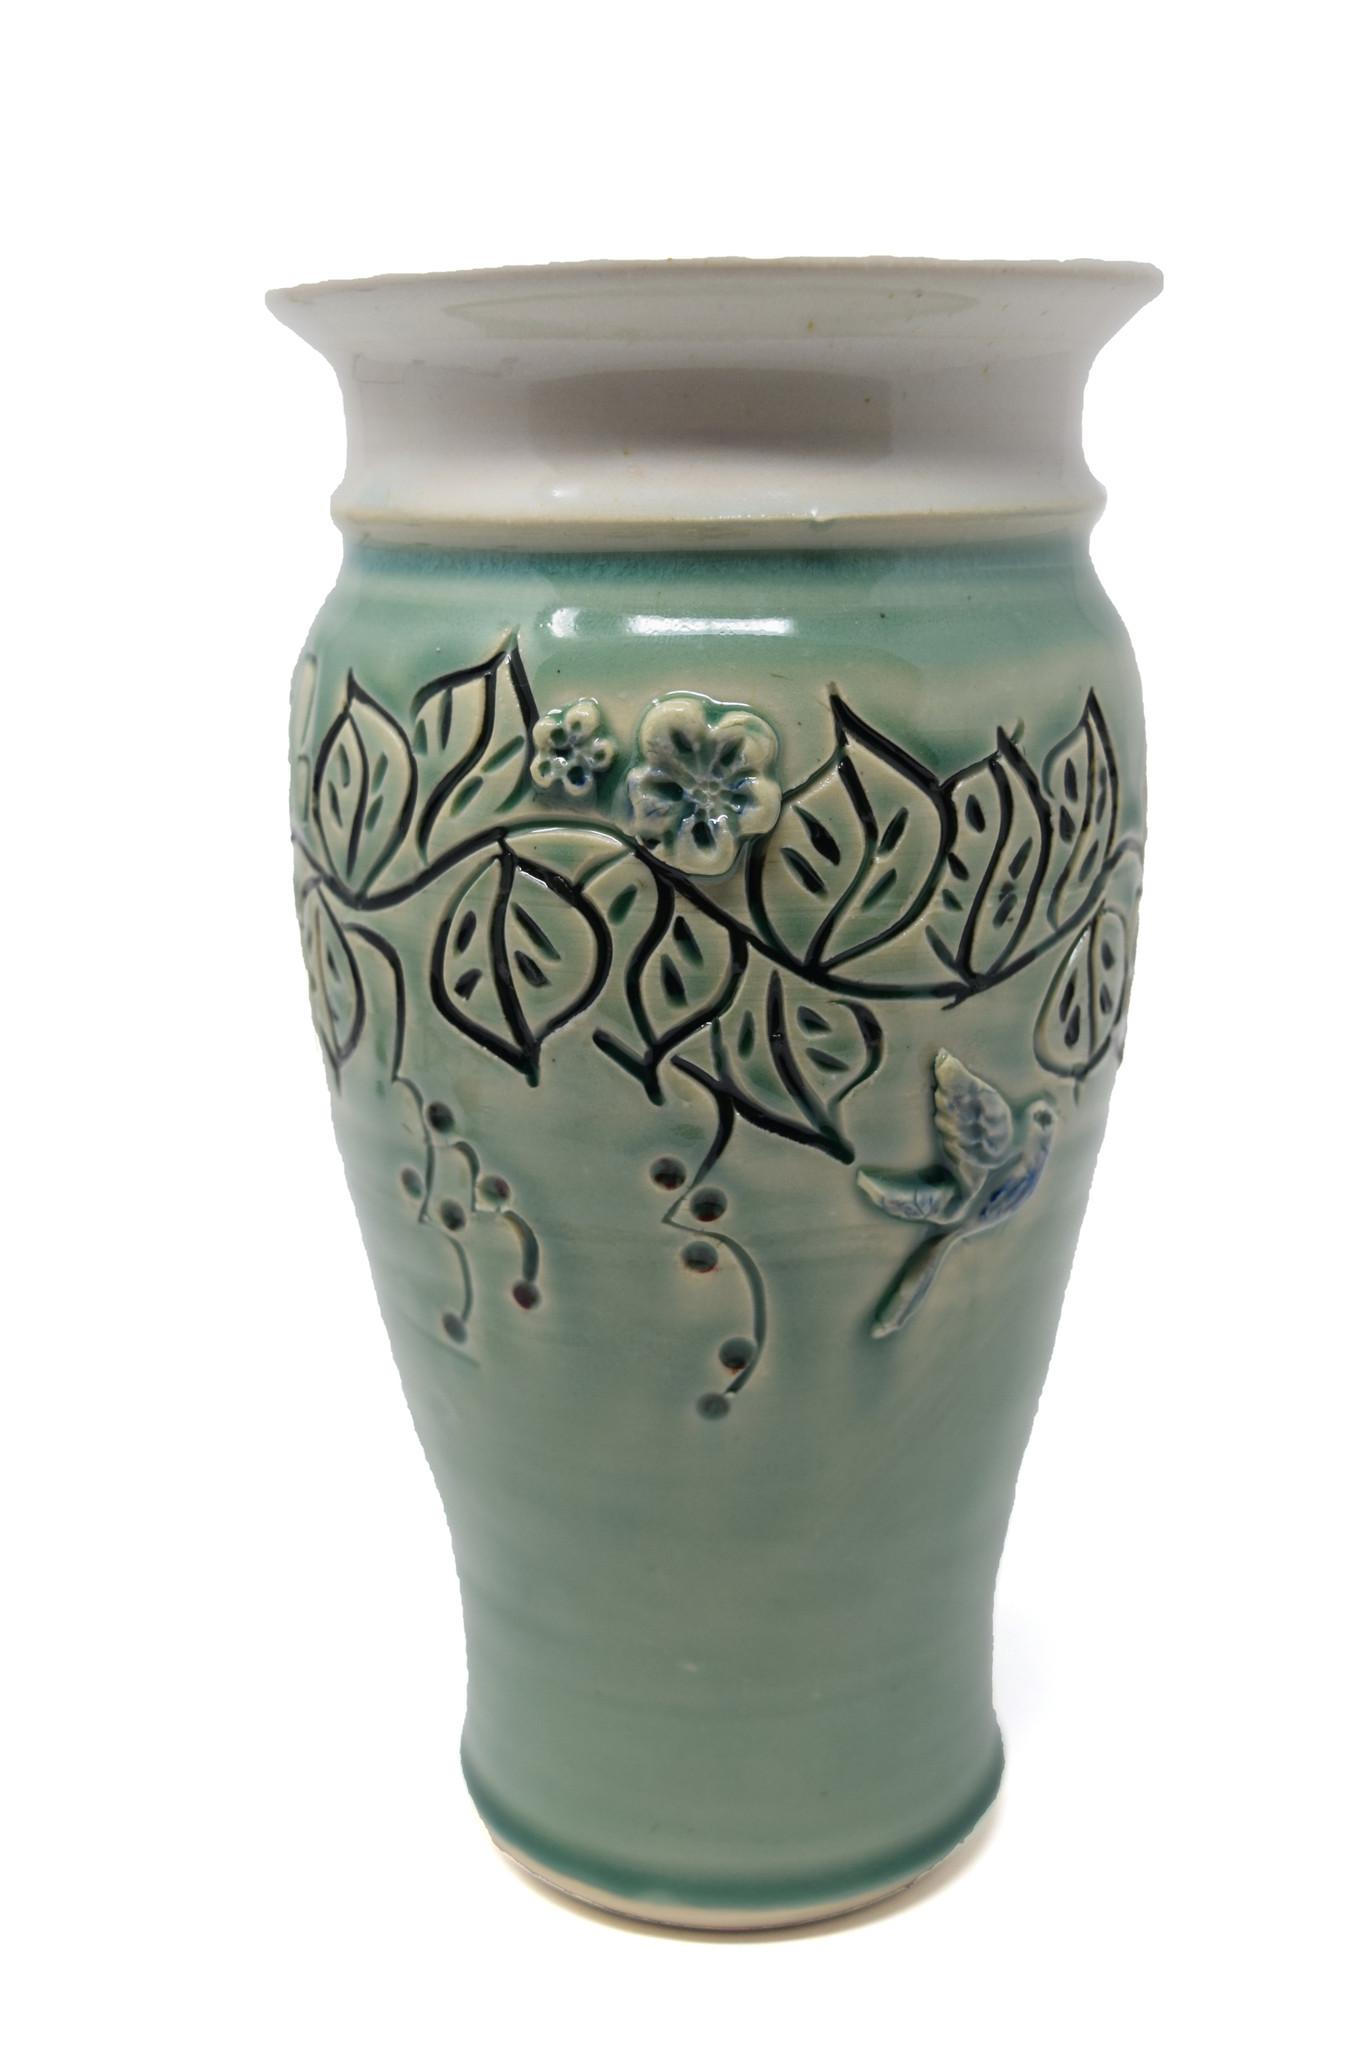 Medium Leaf Vase with Sprigs-1